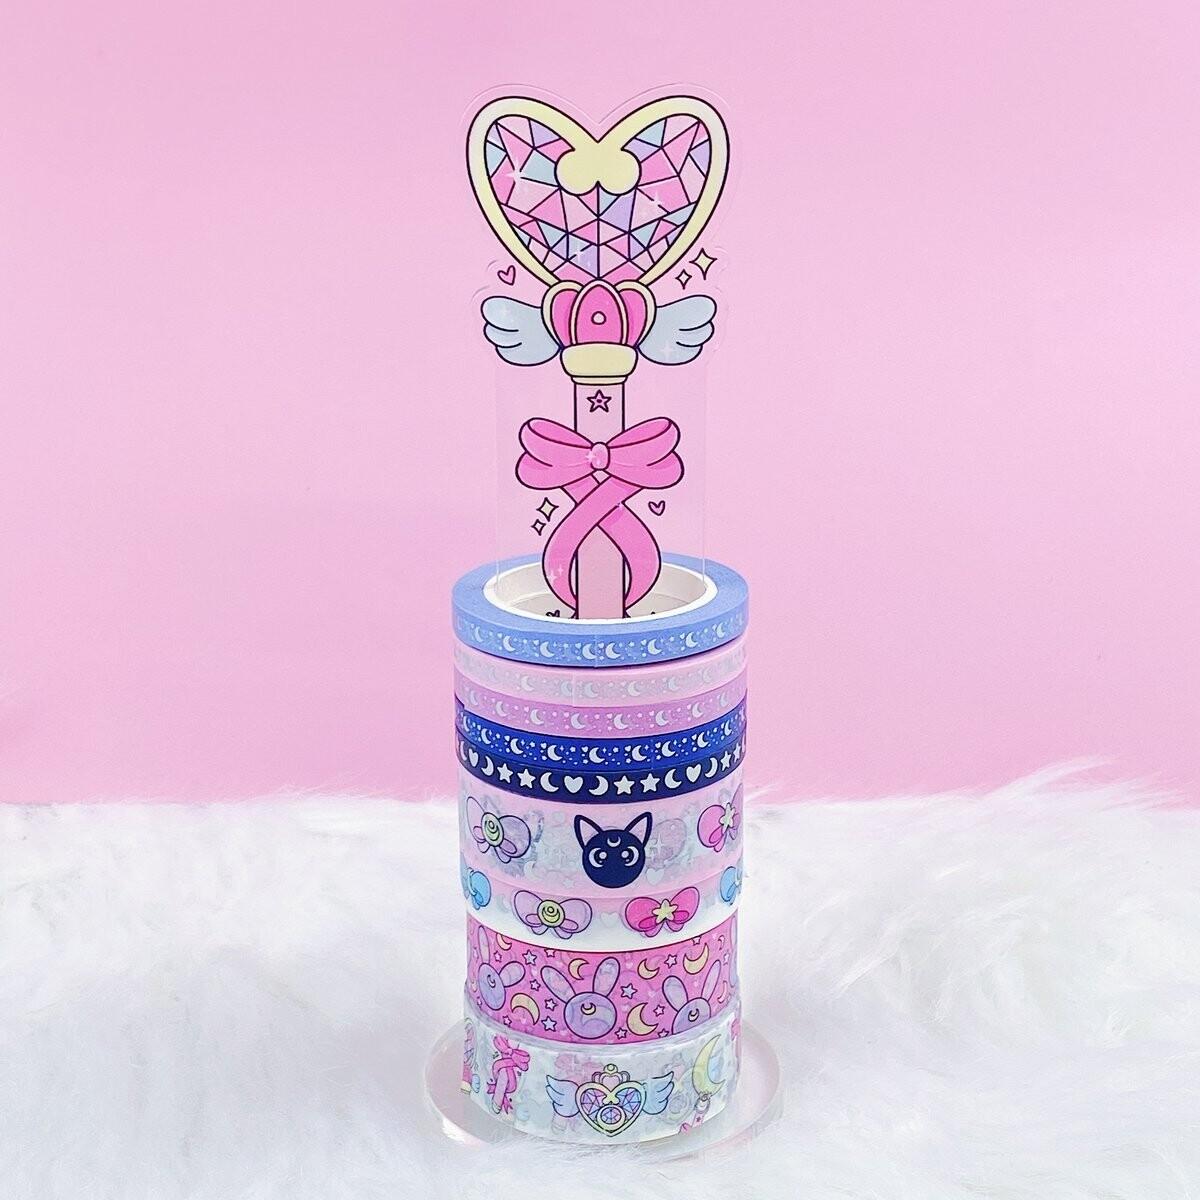 TheHoneyBShop | Fight Like a Girl |Magical Wand Acrylic Washi Stand